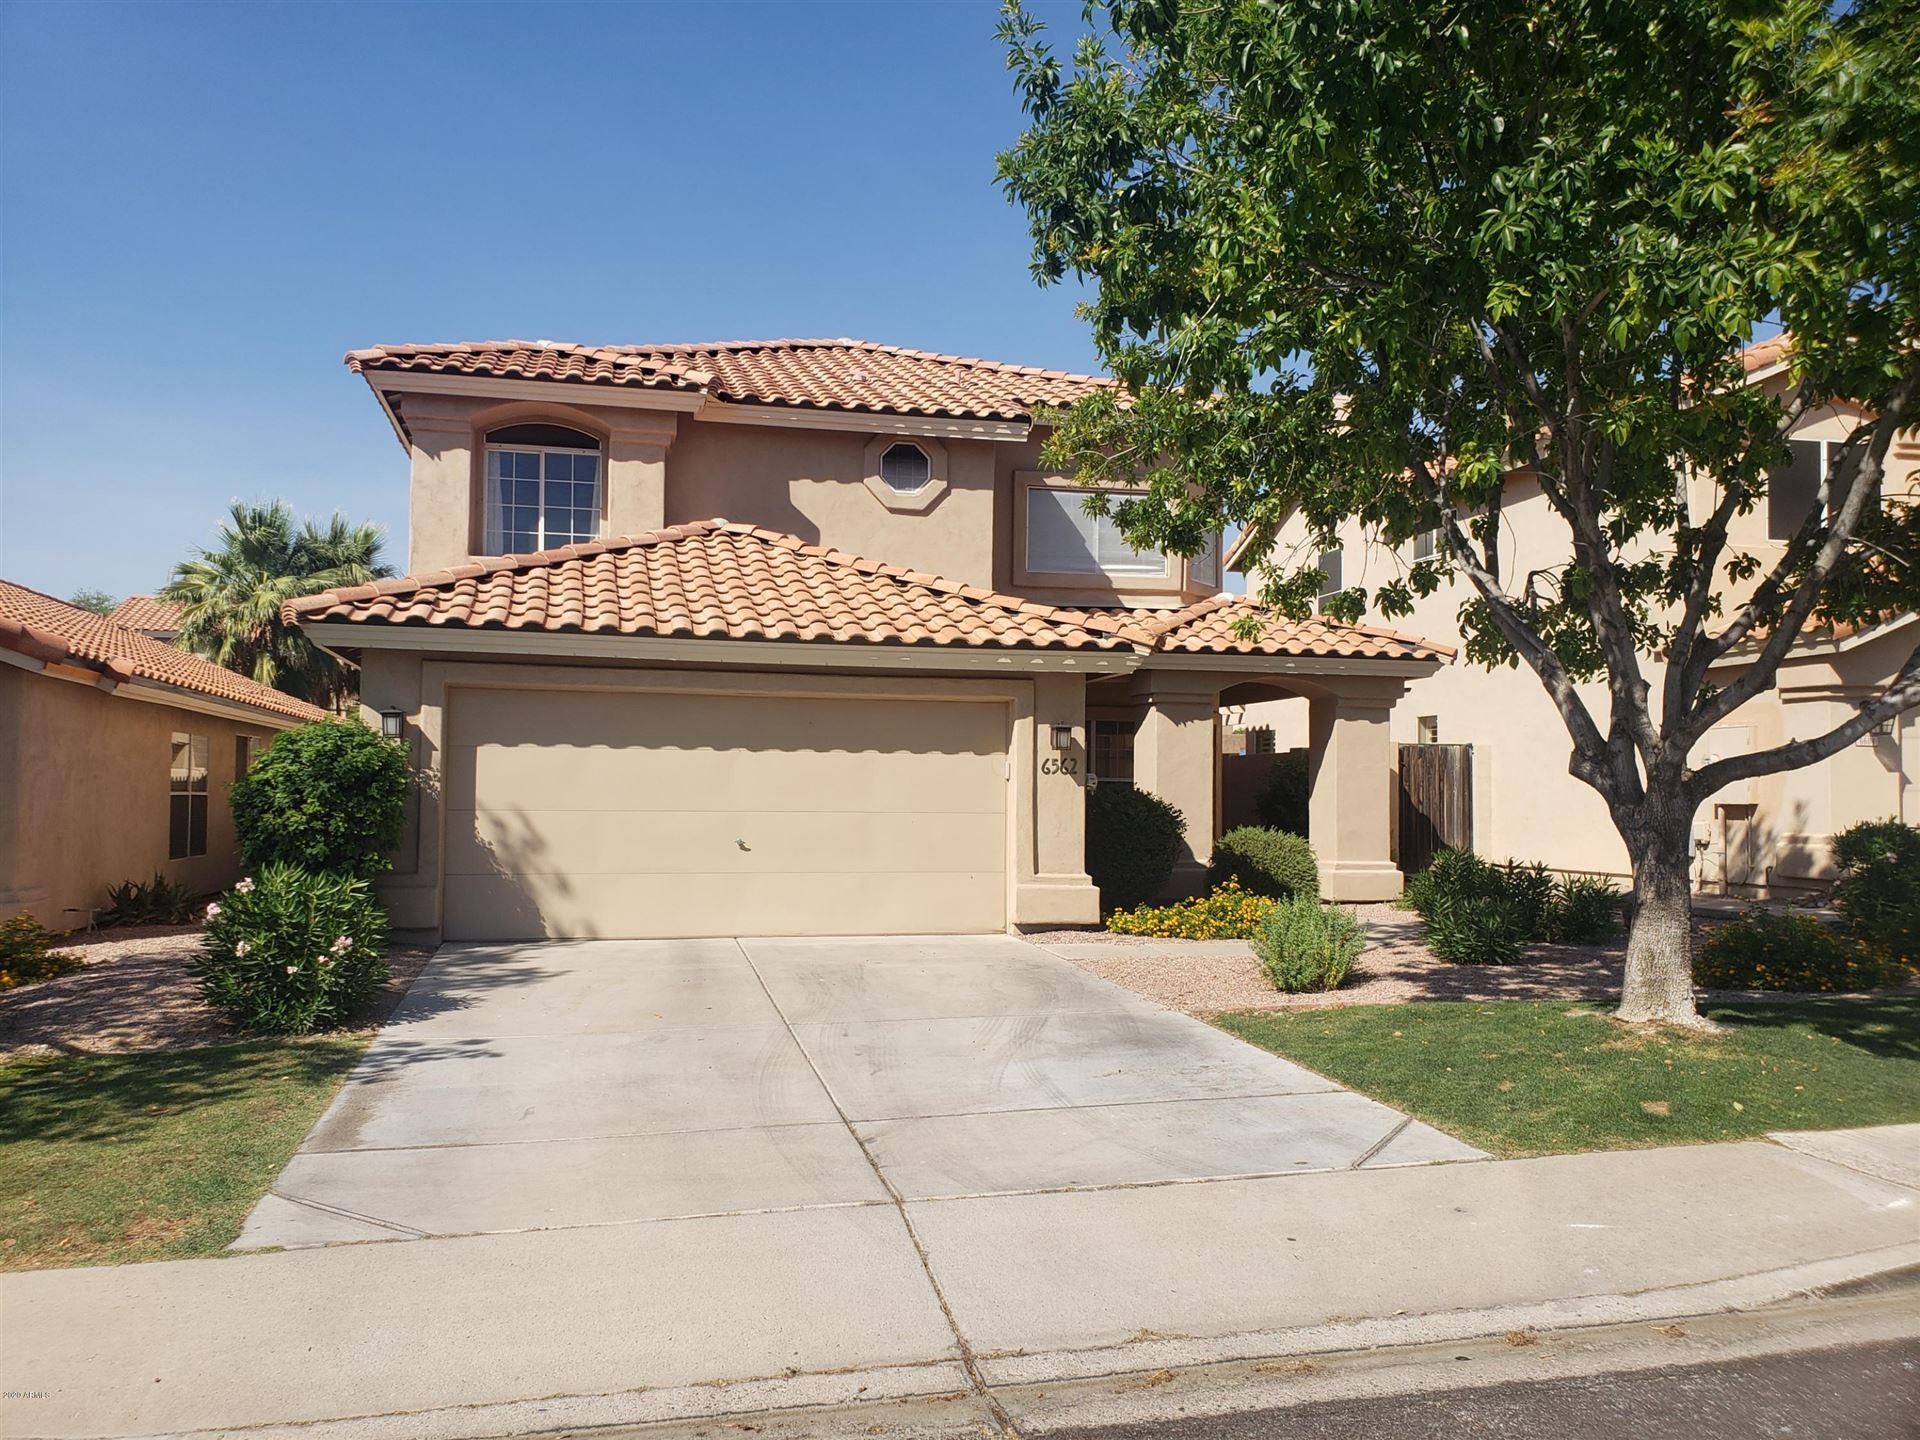 6562 E RAFTRIVER Street, Mesa, AZ 85215 - #: 6090036